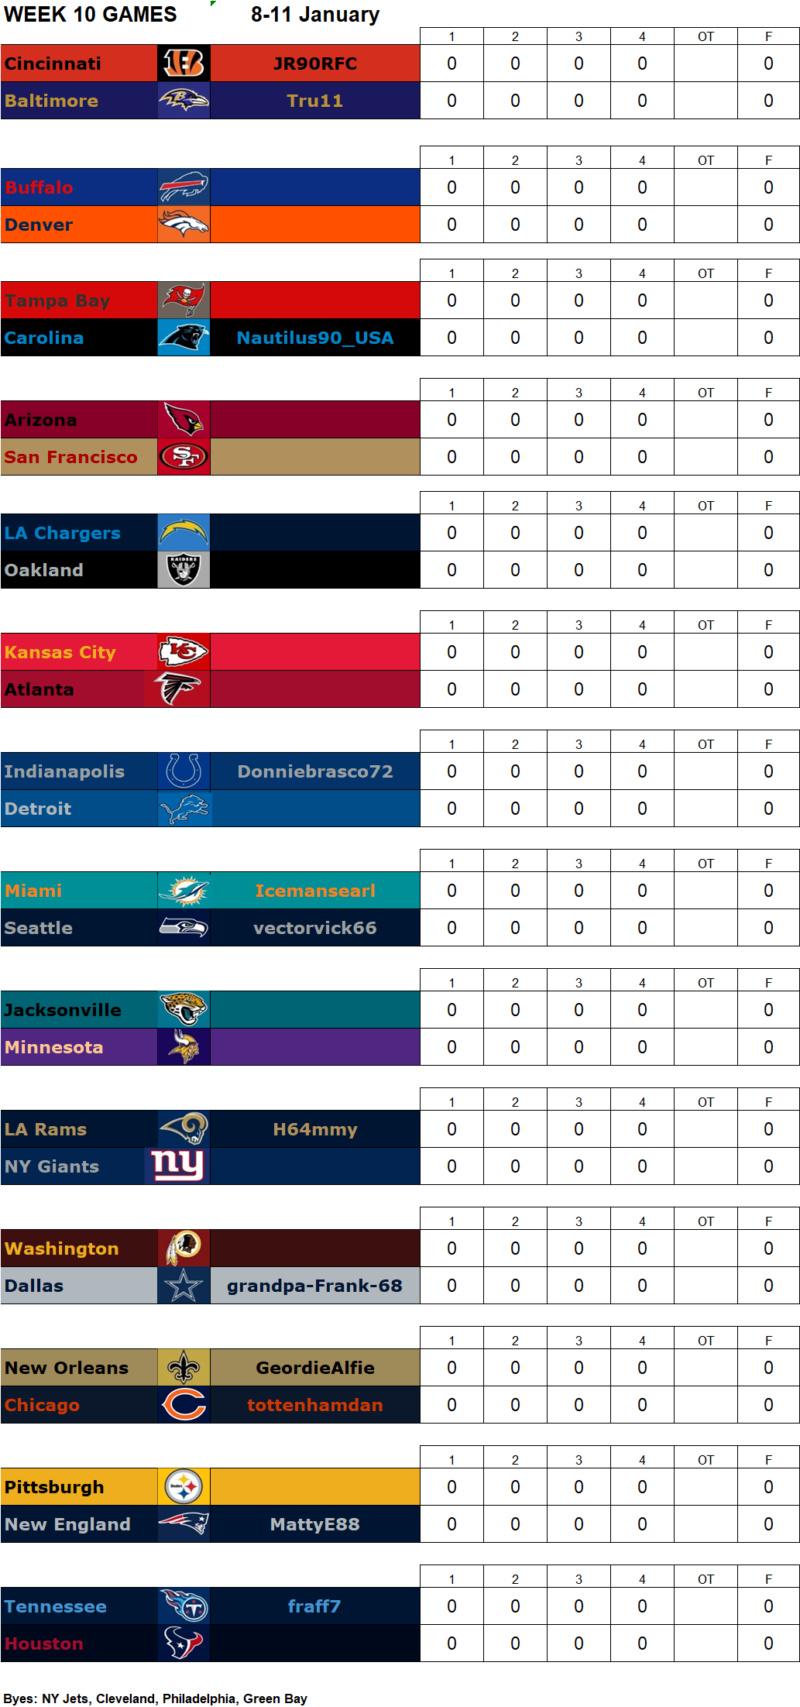 Week 10 Matchups, 8-11 January W10g20